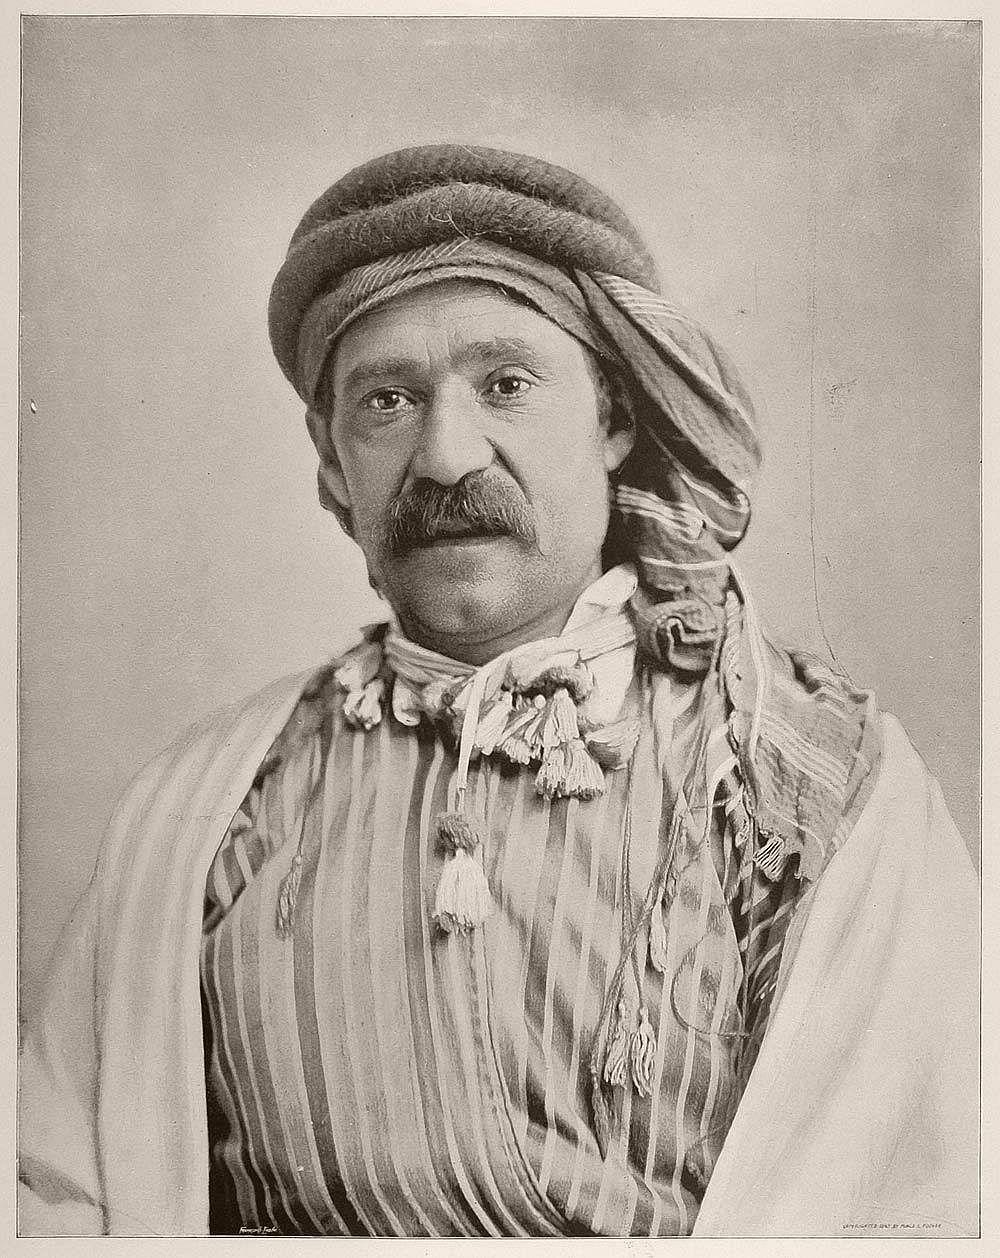 Hallad Abdalah, a Syrian Bedouin sheik.